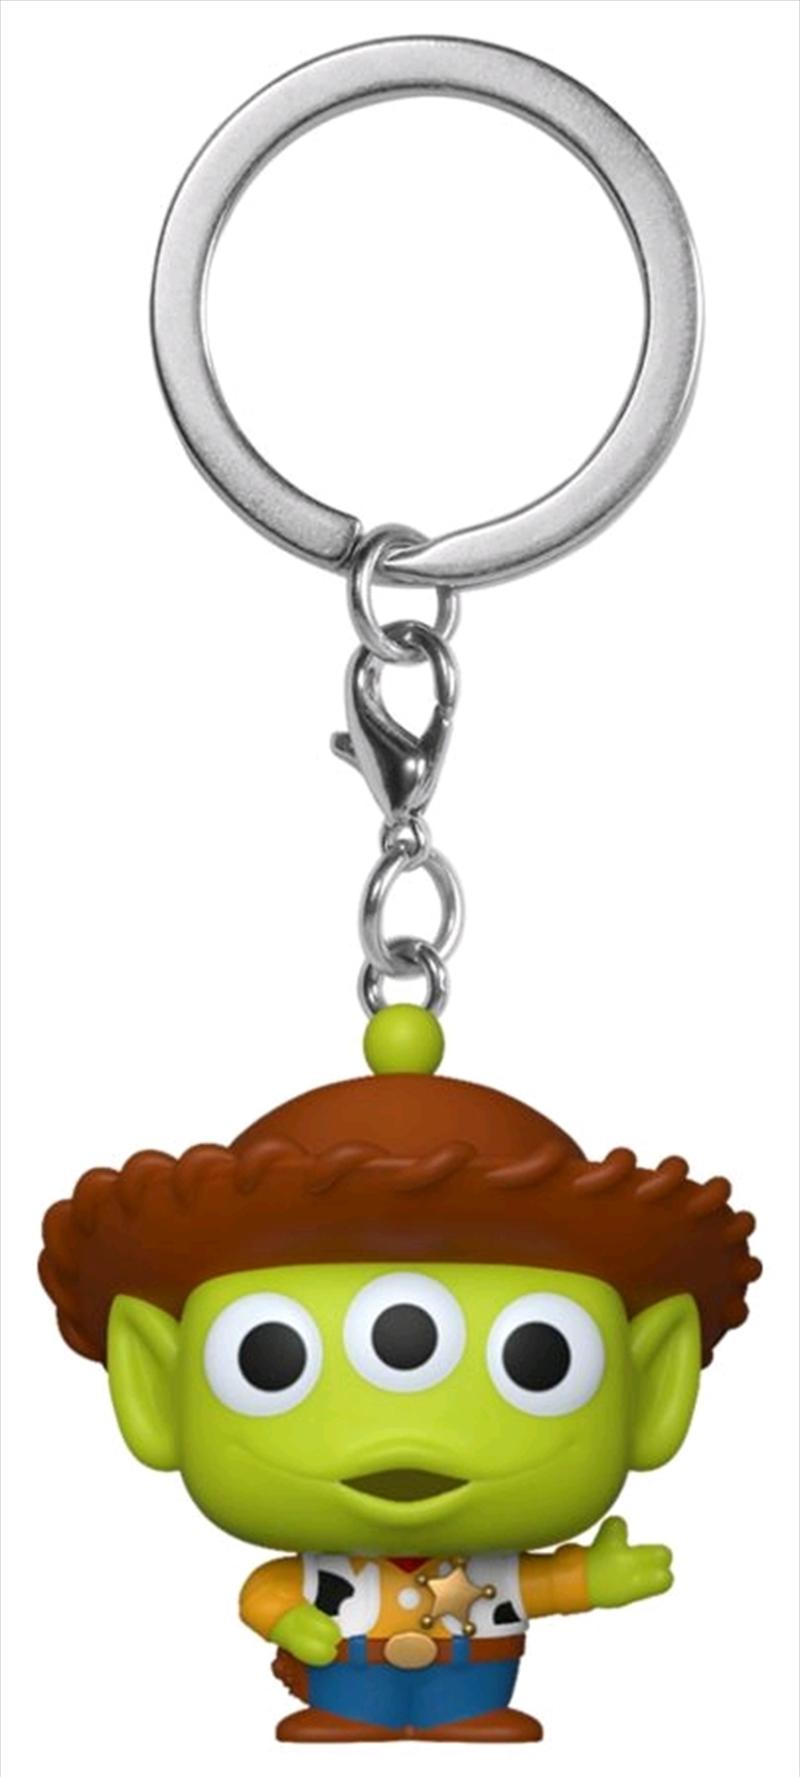 Pixar - Alien Remix Woody Pocket Pop! Keychain   Pop Vinyl